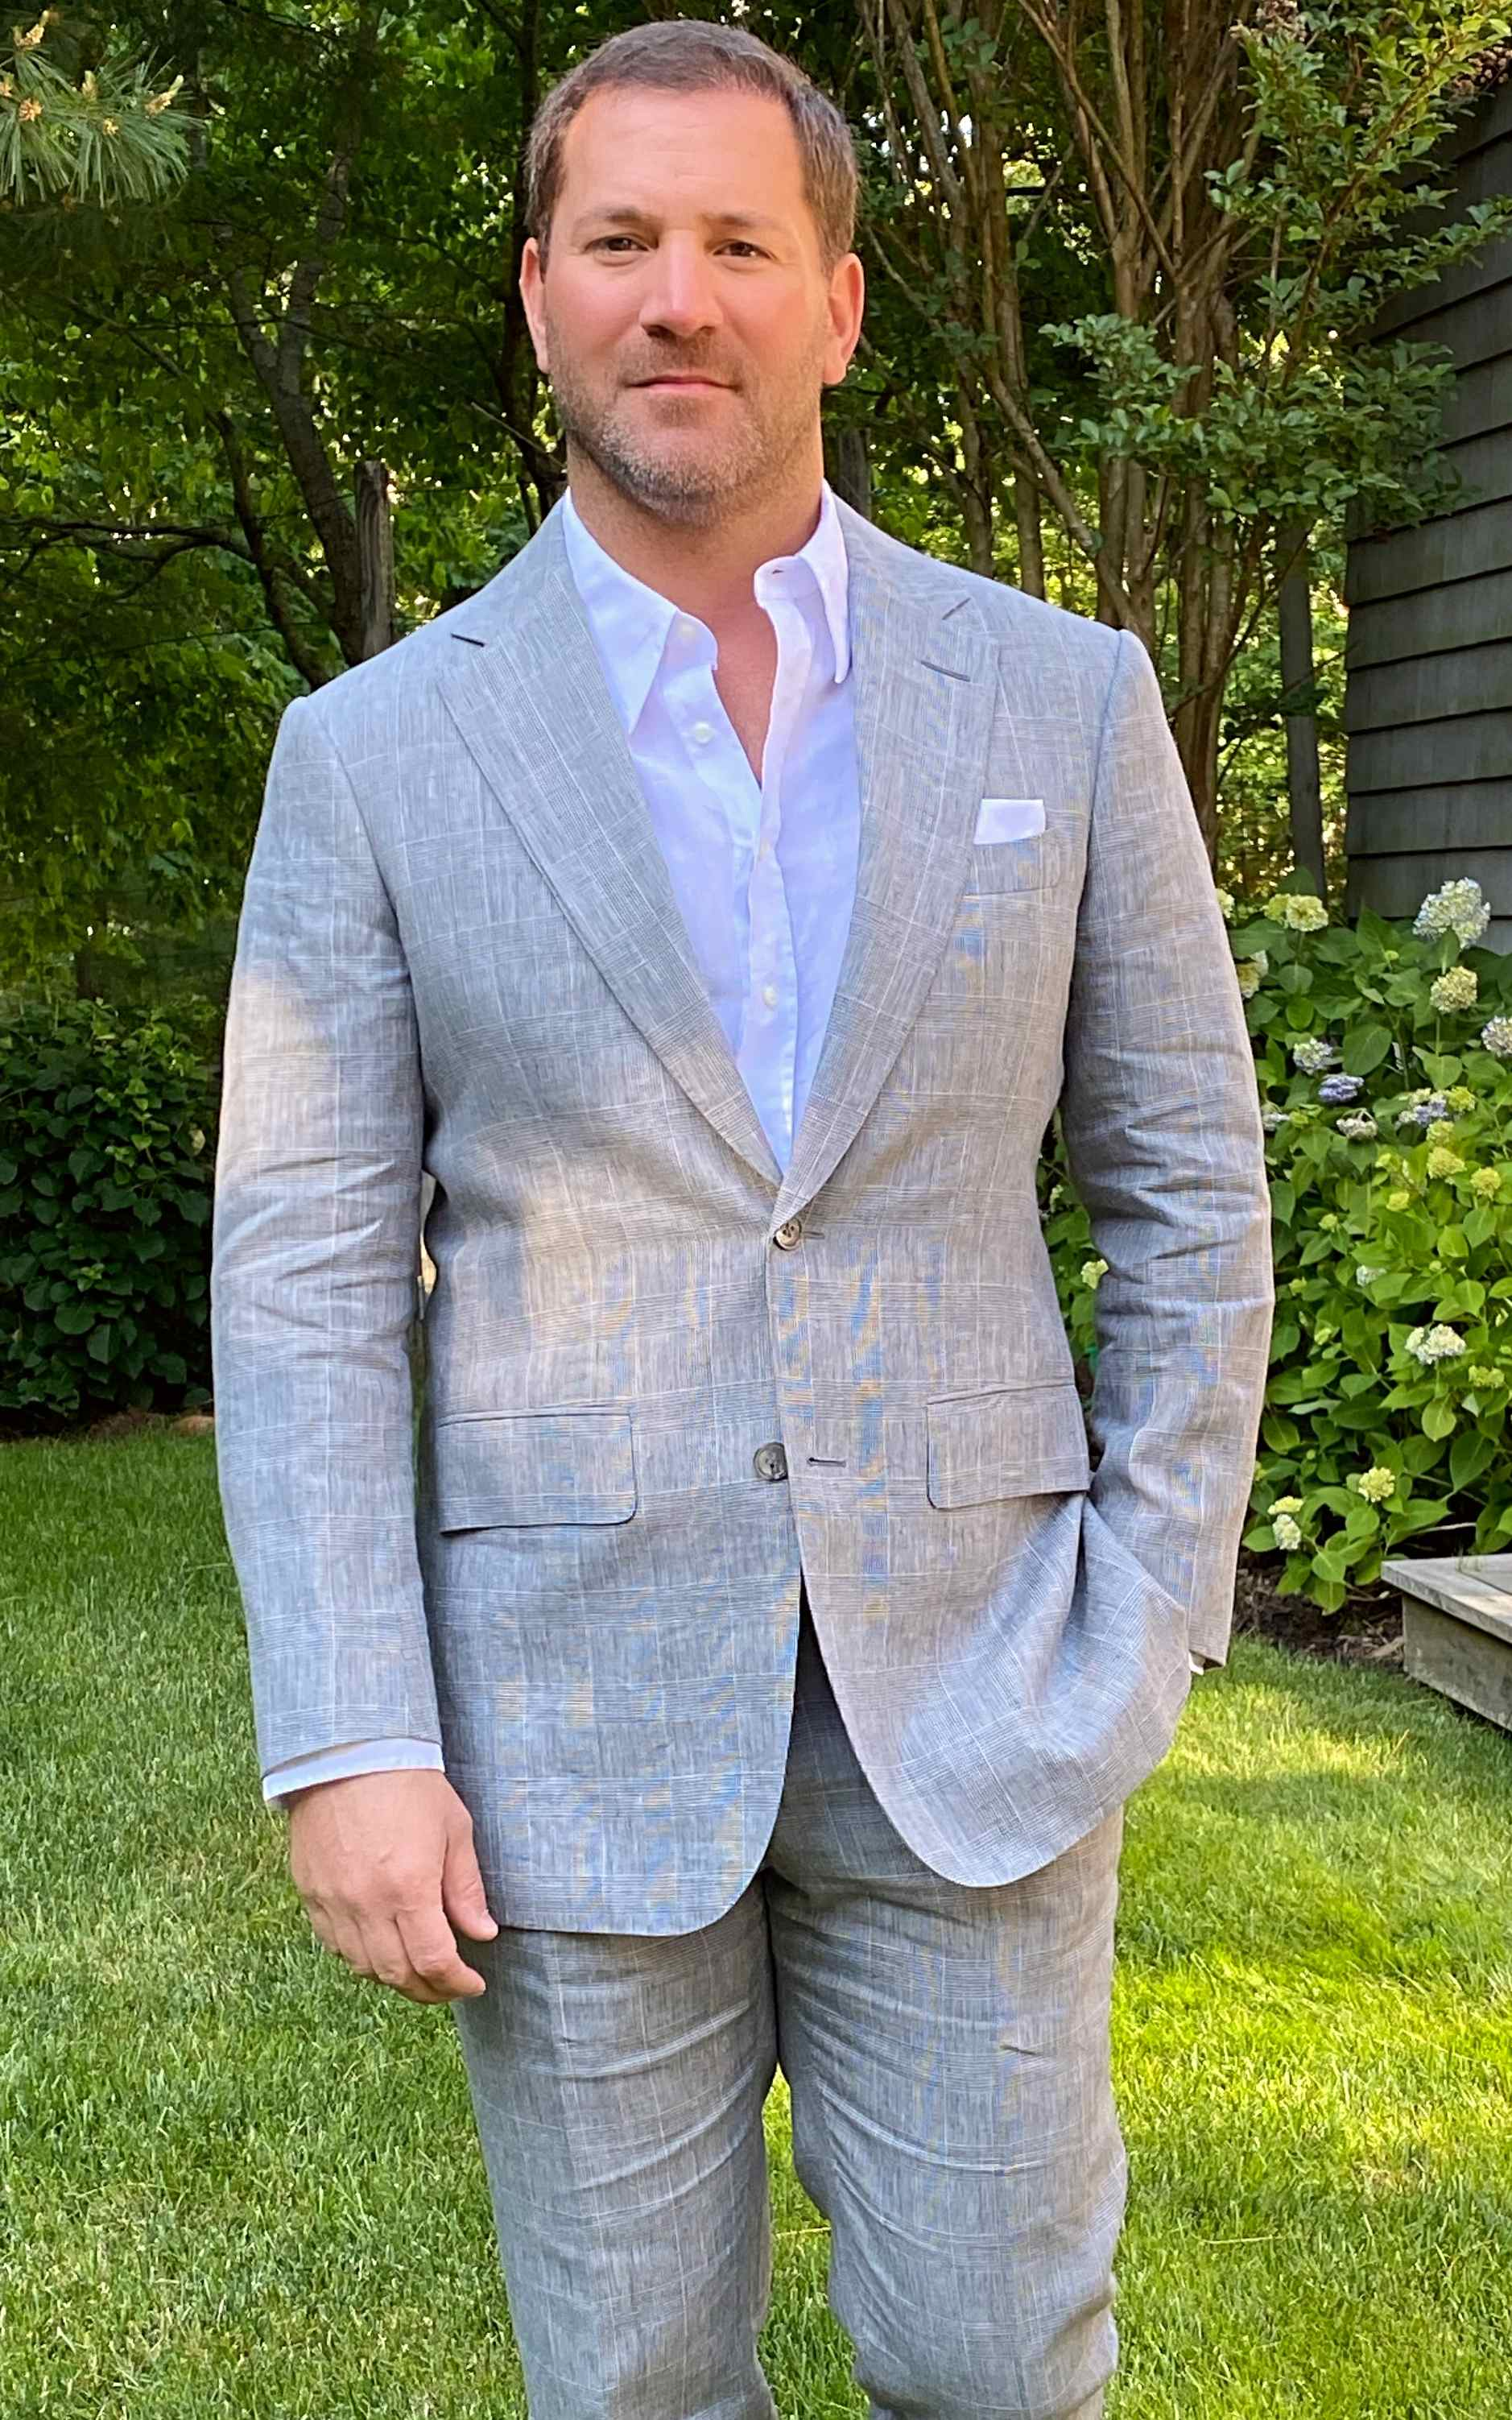 Blue/White Linen Glen Check Suit